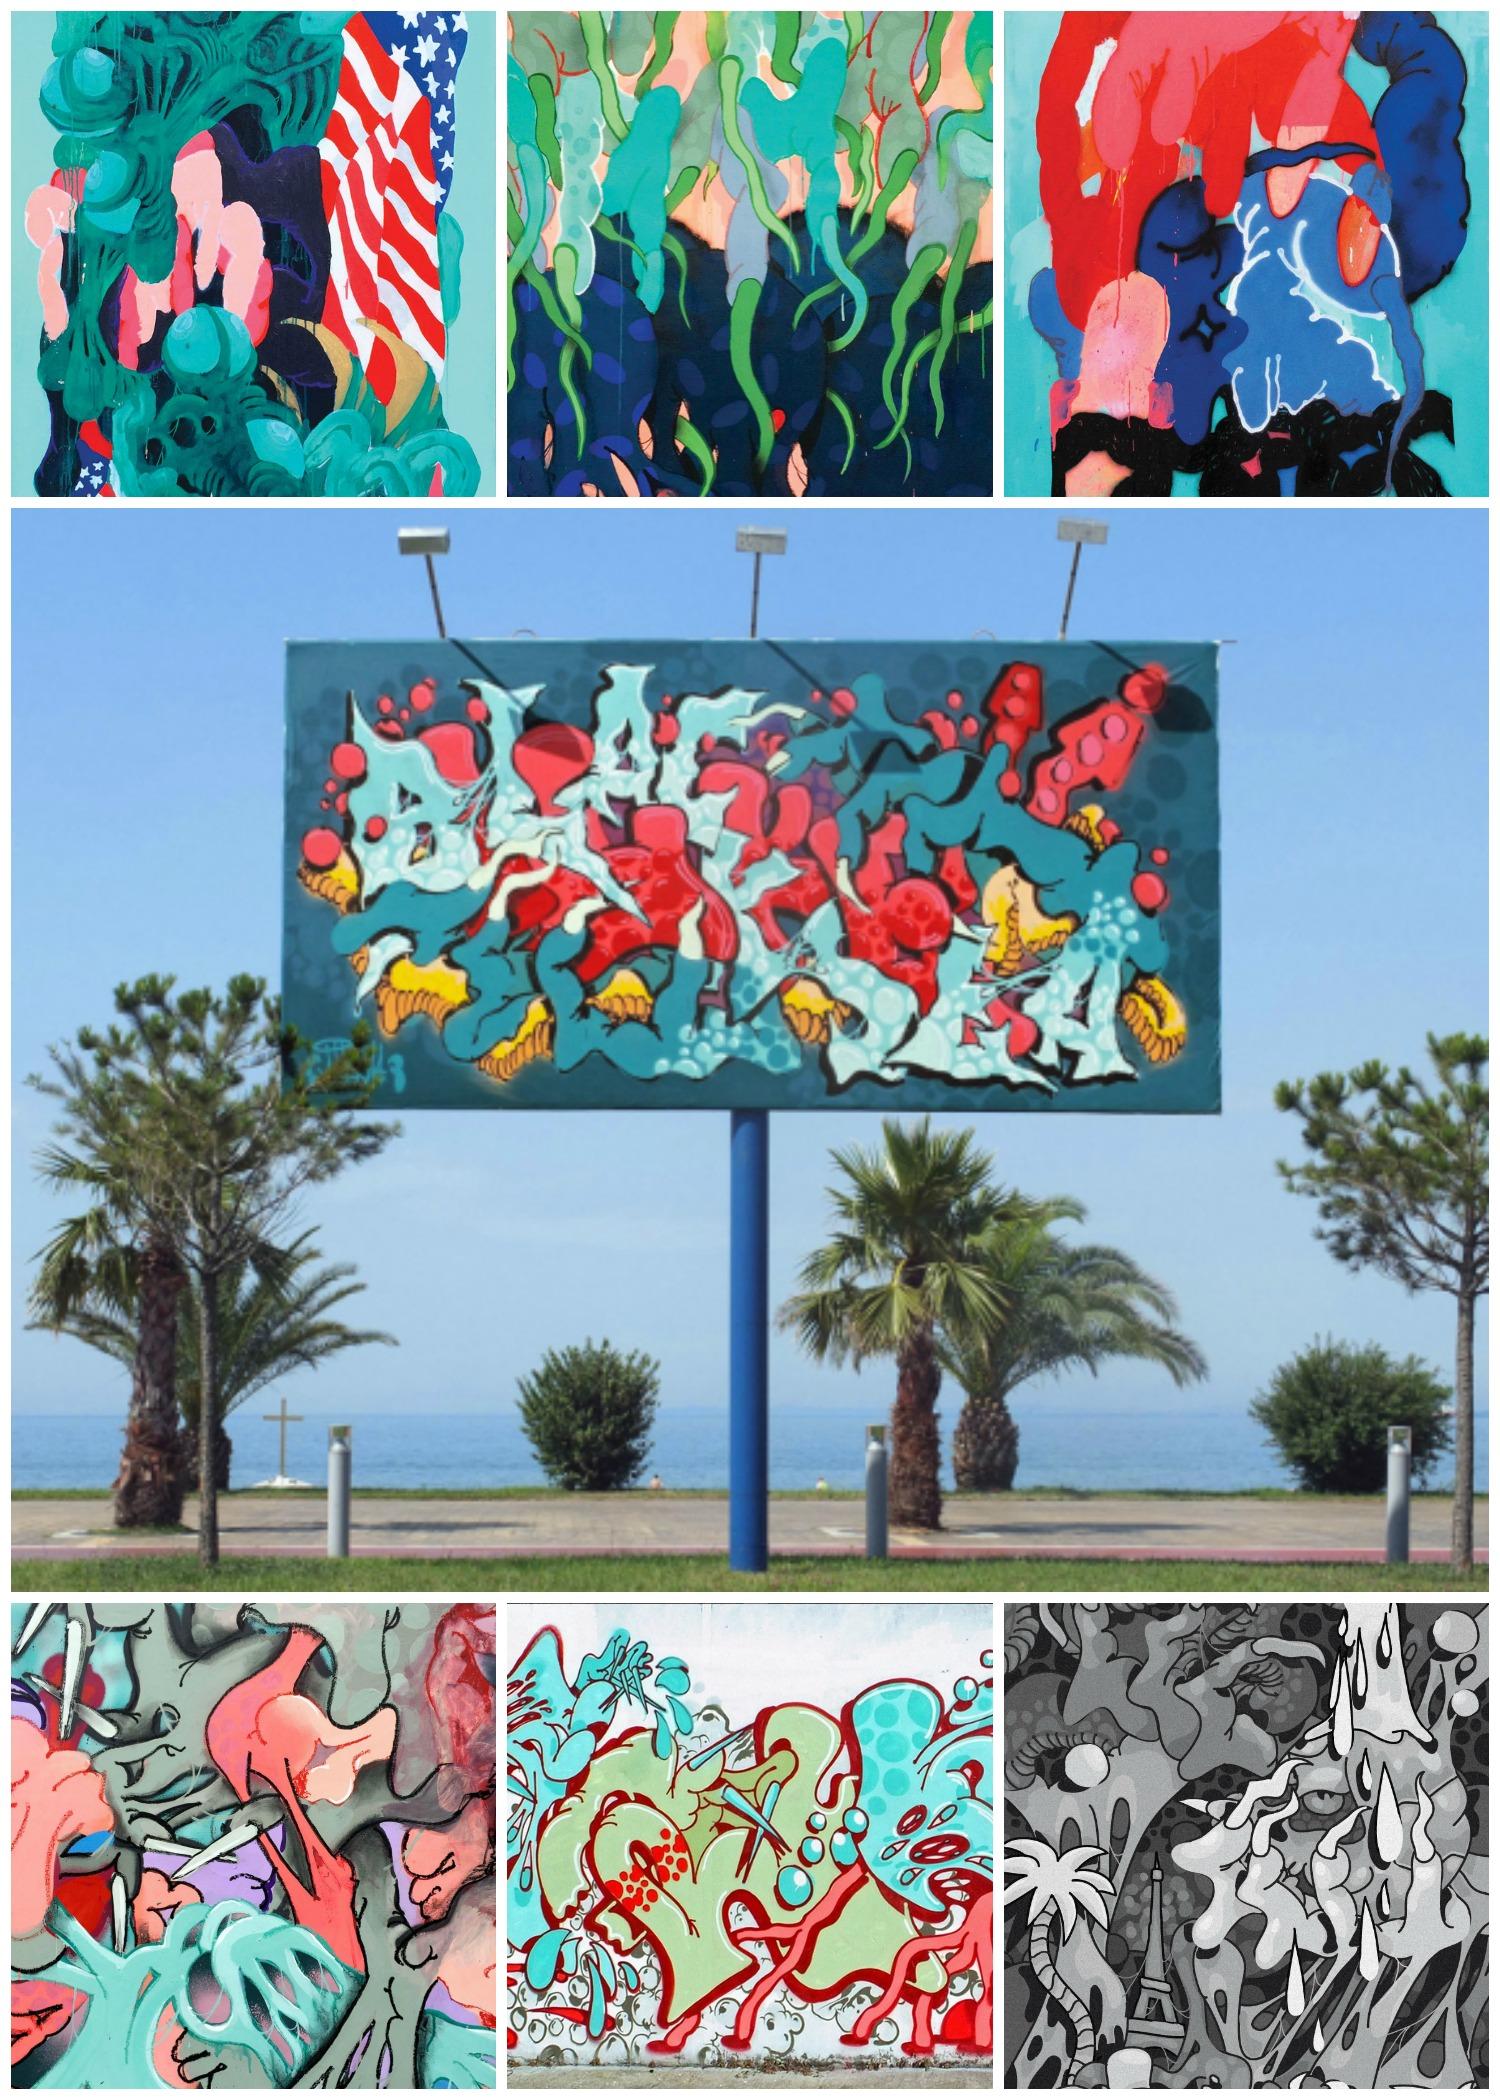 Ilk street art les confettis